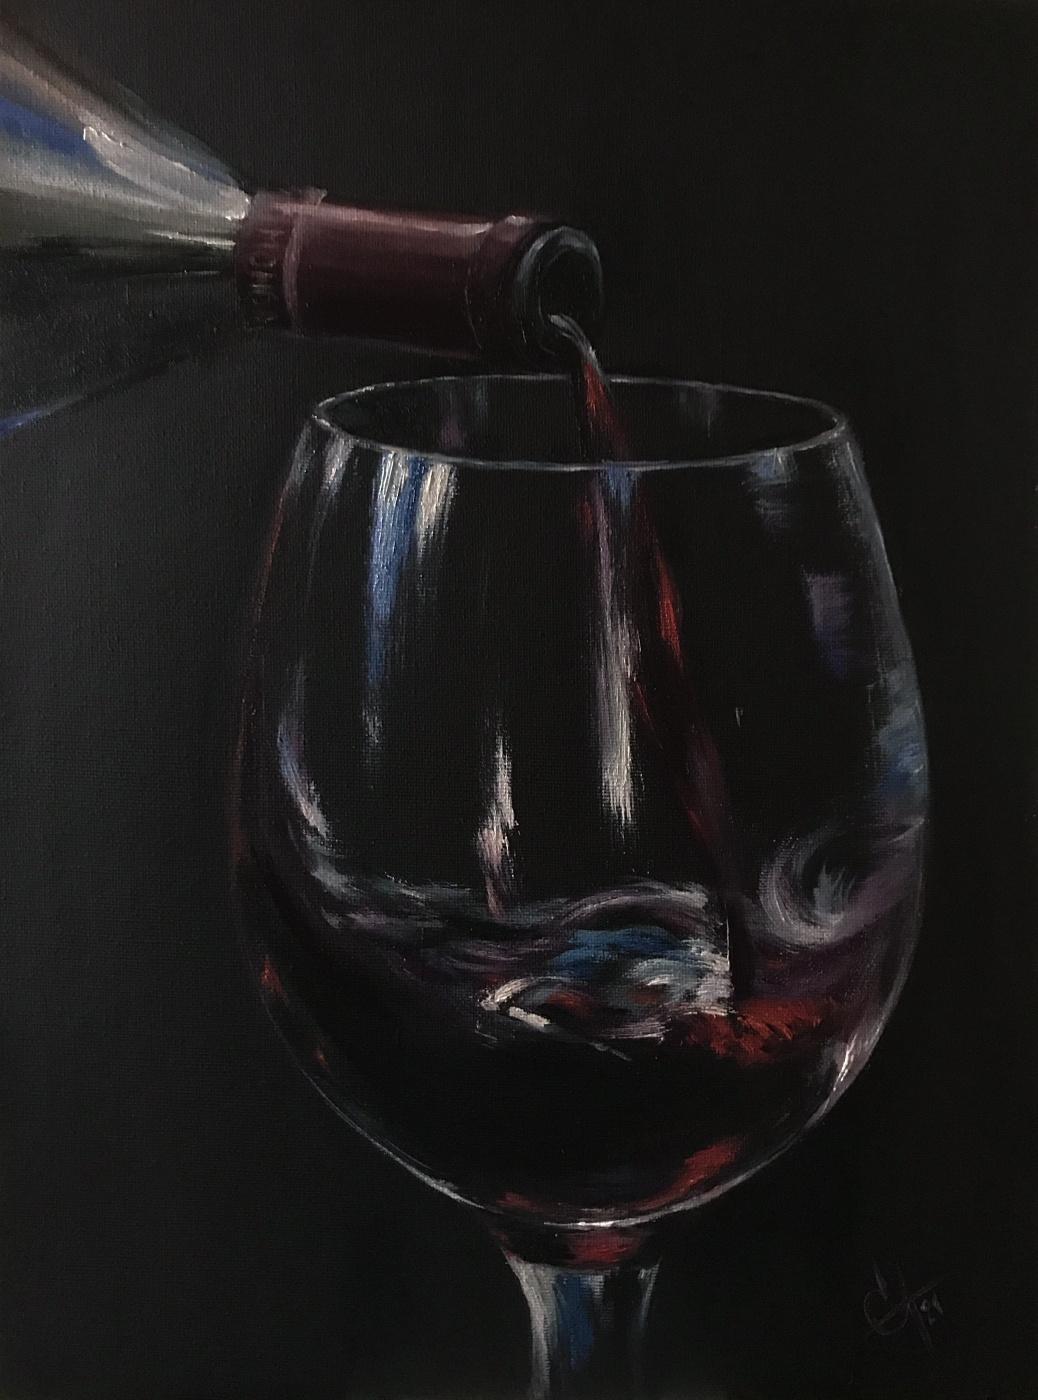 Svetlana Arkhipova. Glass of Bordeaux